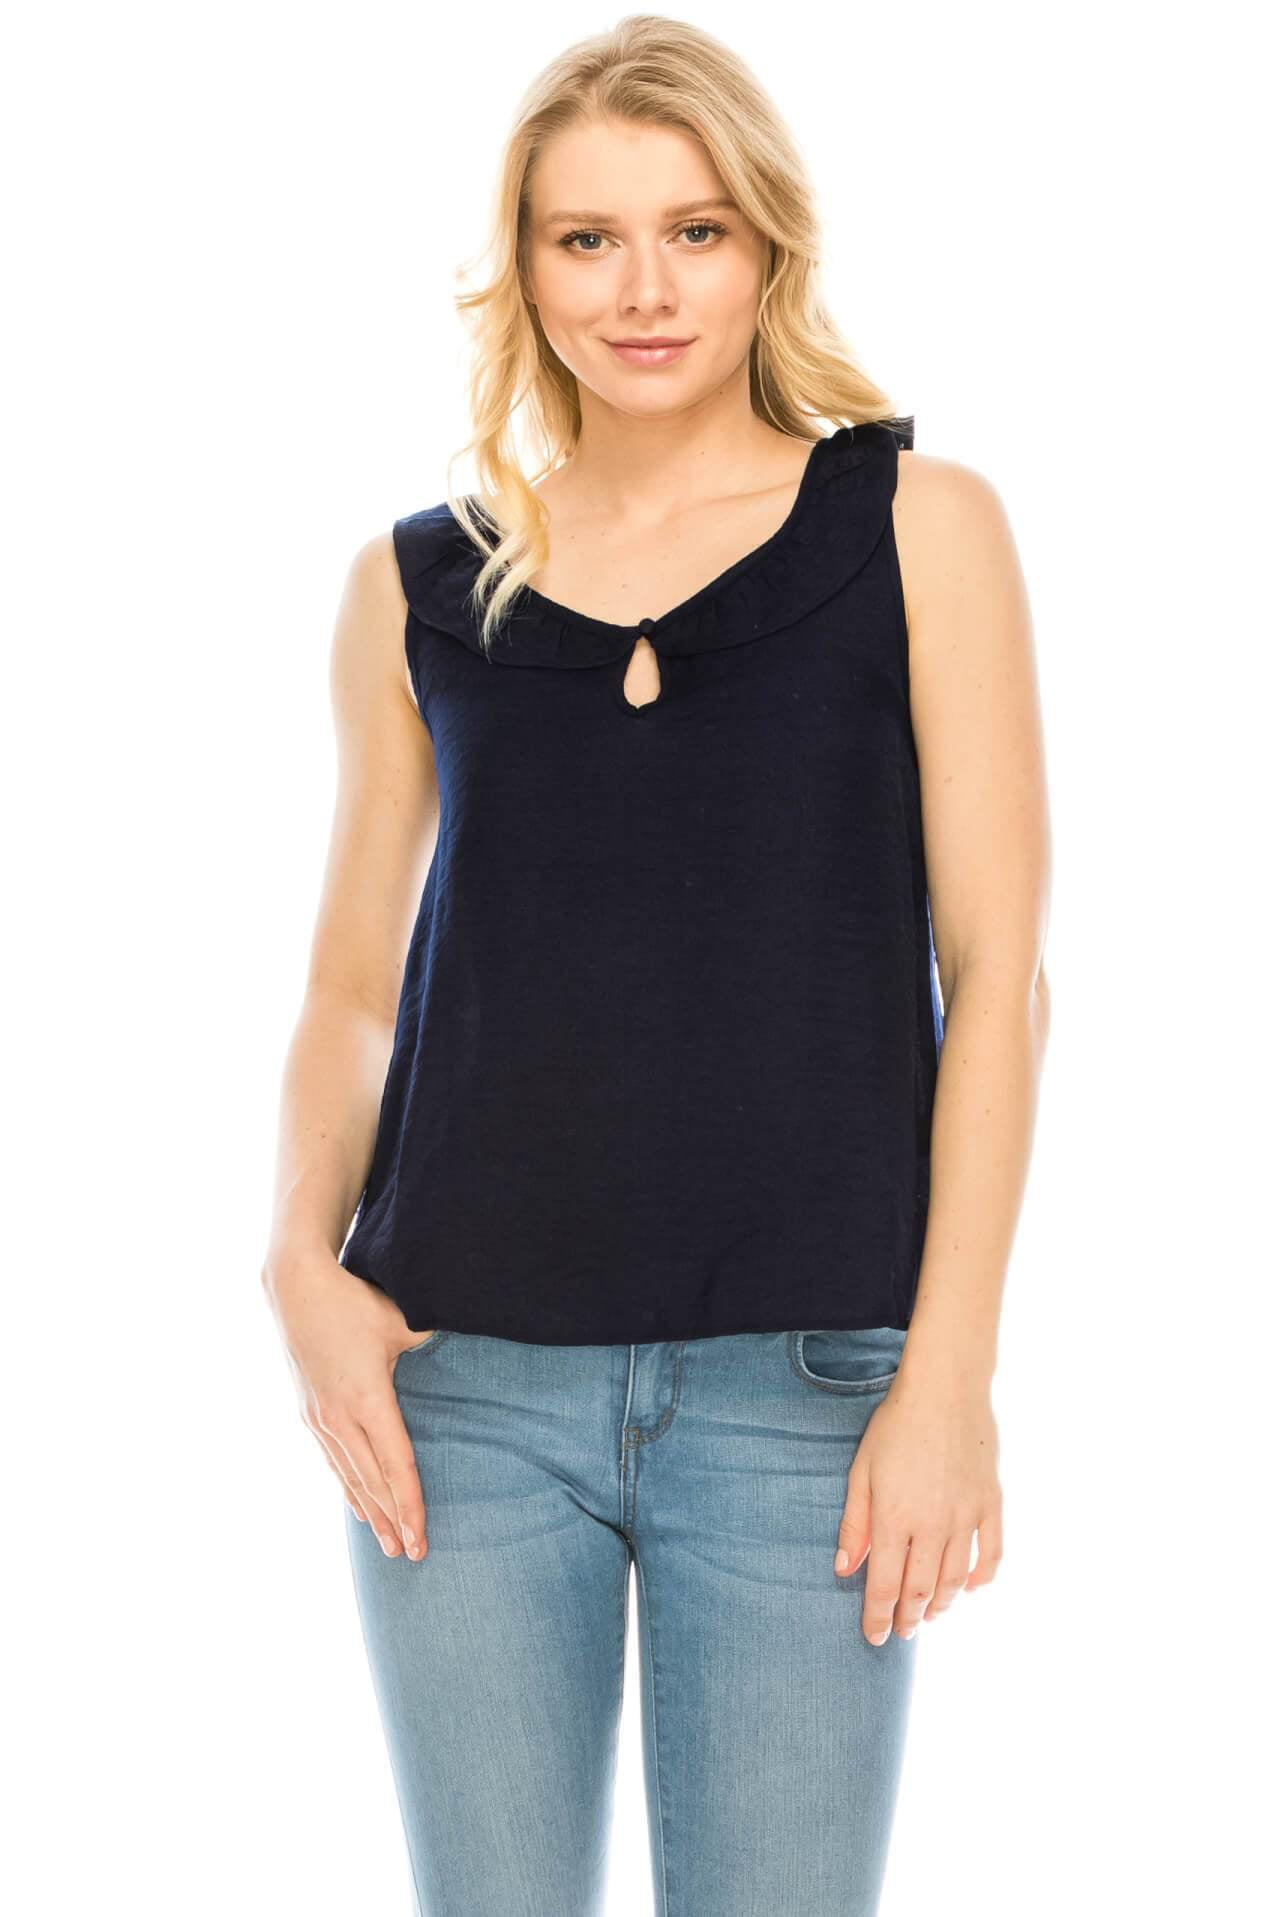 594172c0d0936 Mine - Salt Tree Women s Keyhole Neck Ruffles Sleeveless Shimmer Flare Top  - Walmart.com